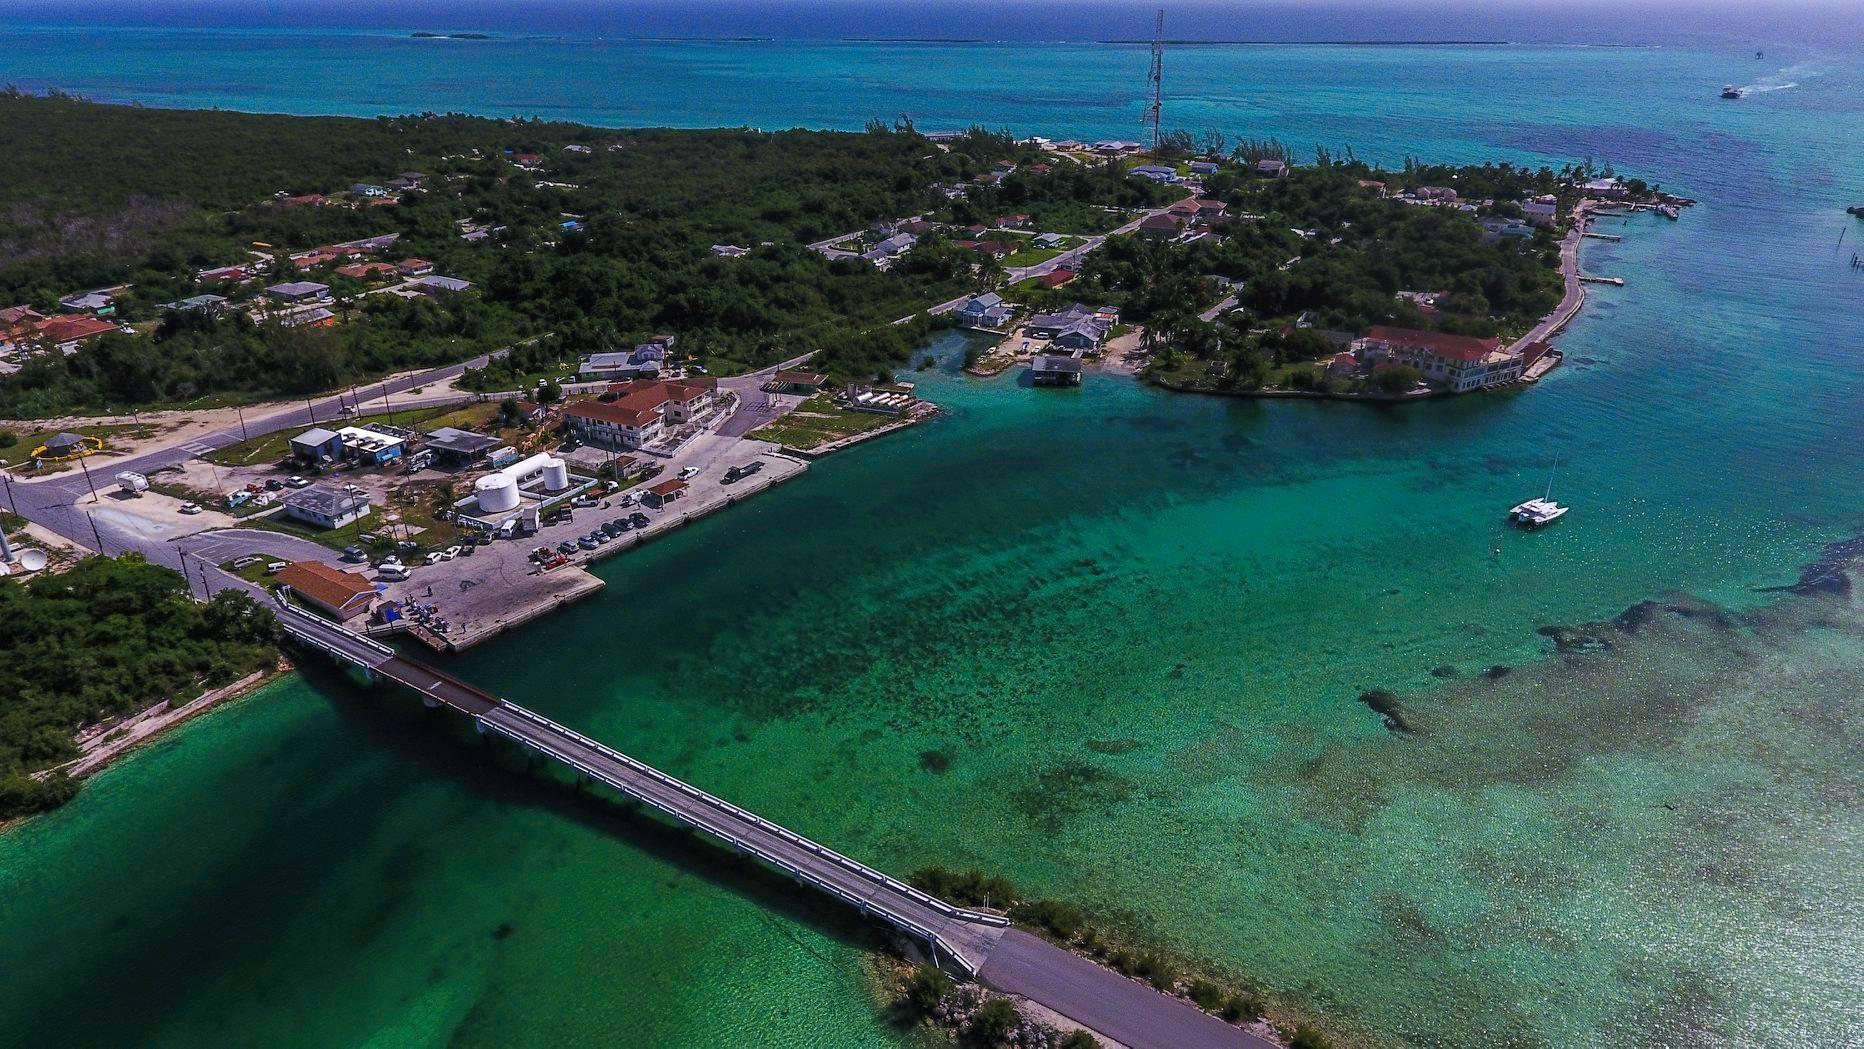 Fresh Creek - Coakley Town - Andros Island Bahamas